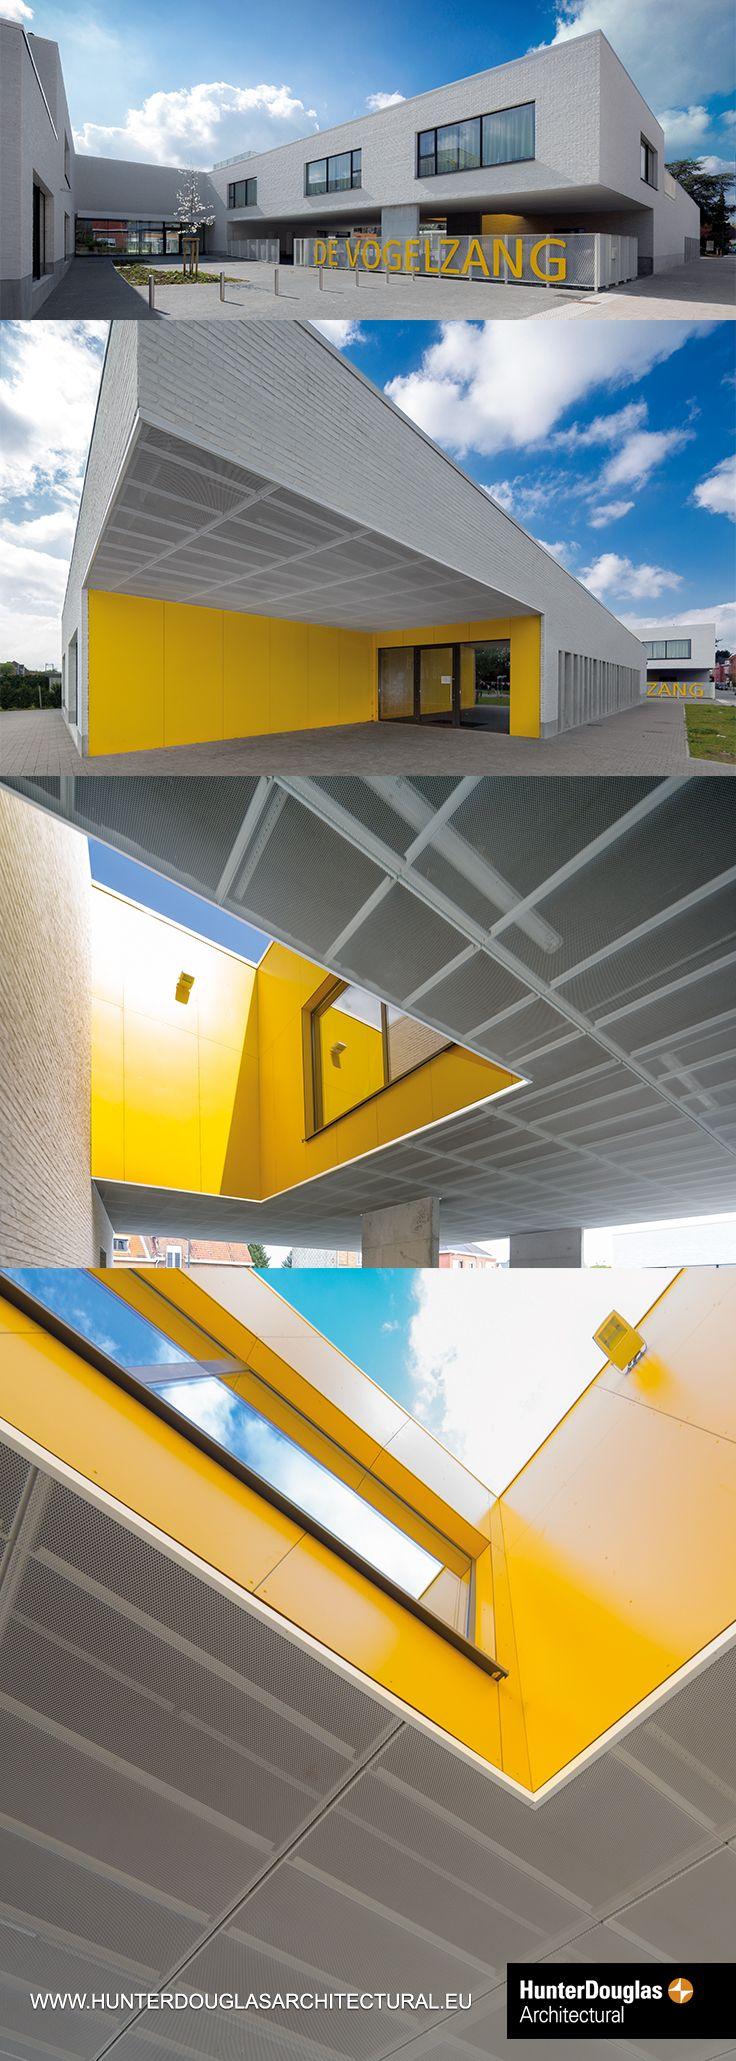 NL: Strekmetaal buiten plafond van Hunter Douglas Architectural. Project: Basisschool Vogelzang. Architect: PLANOMATIC. #architectuur #plafond #design #gebouwen